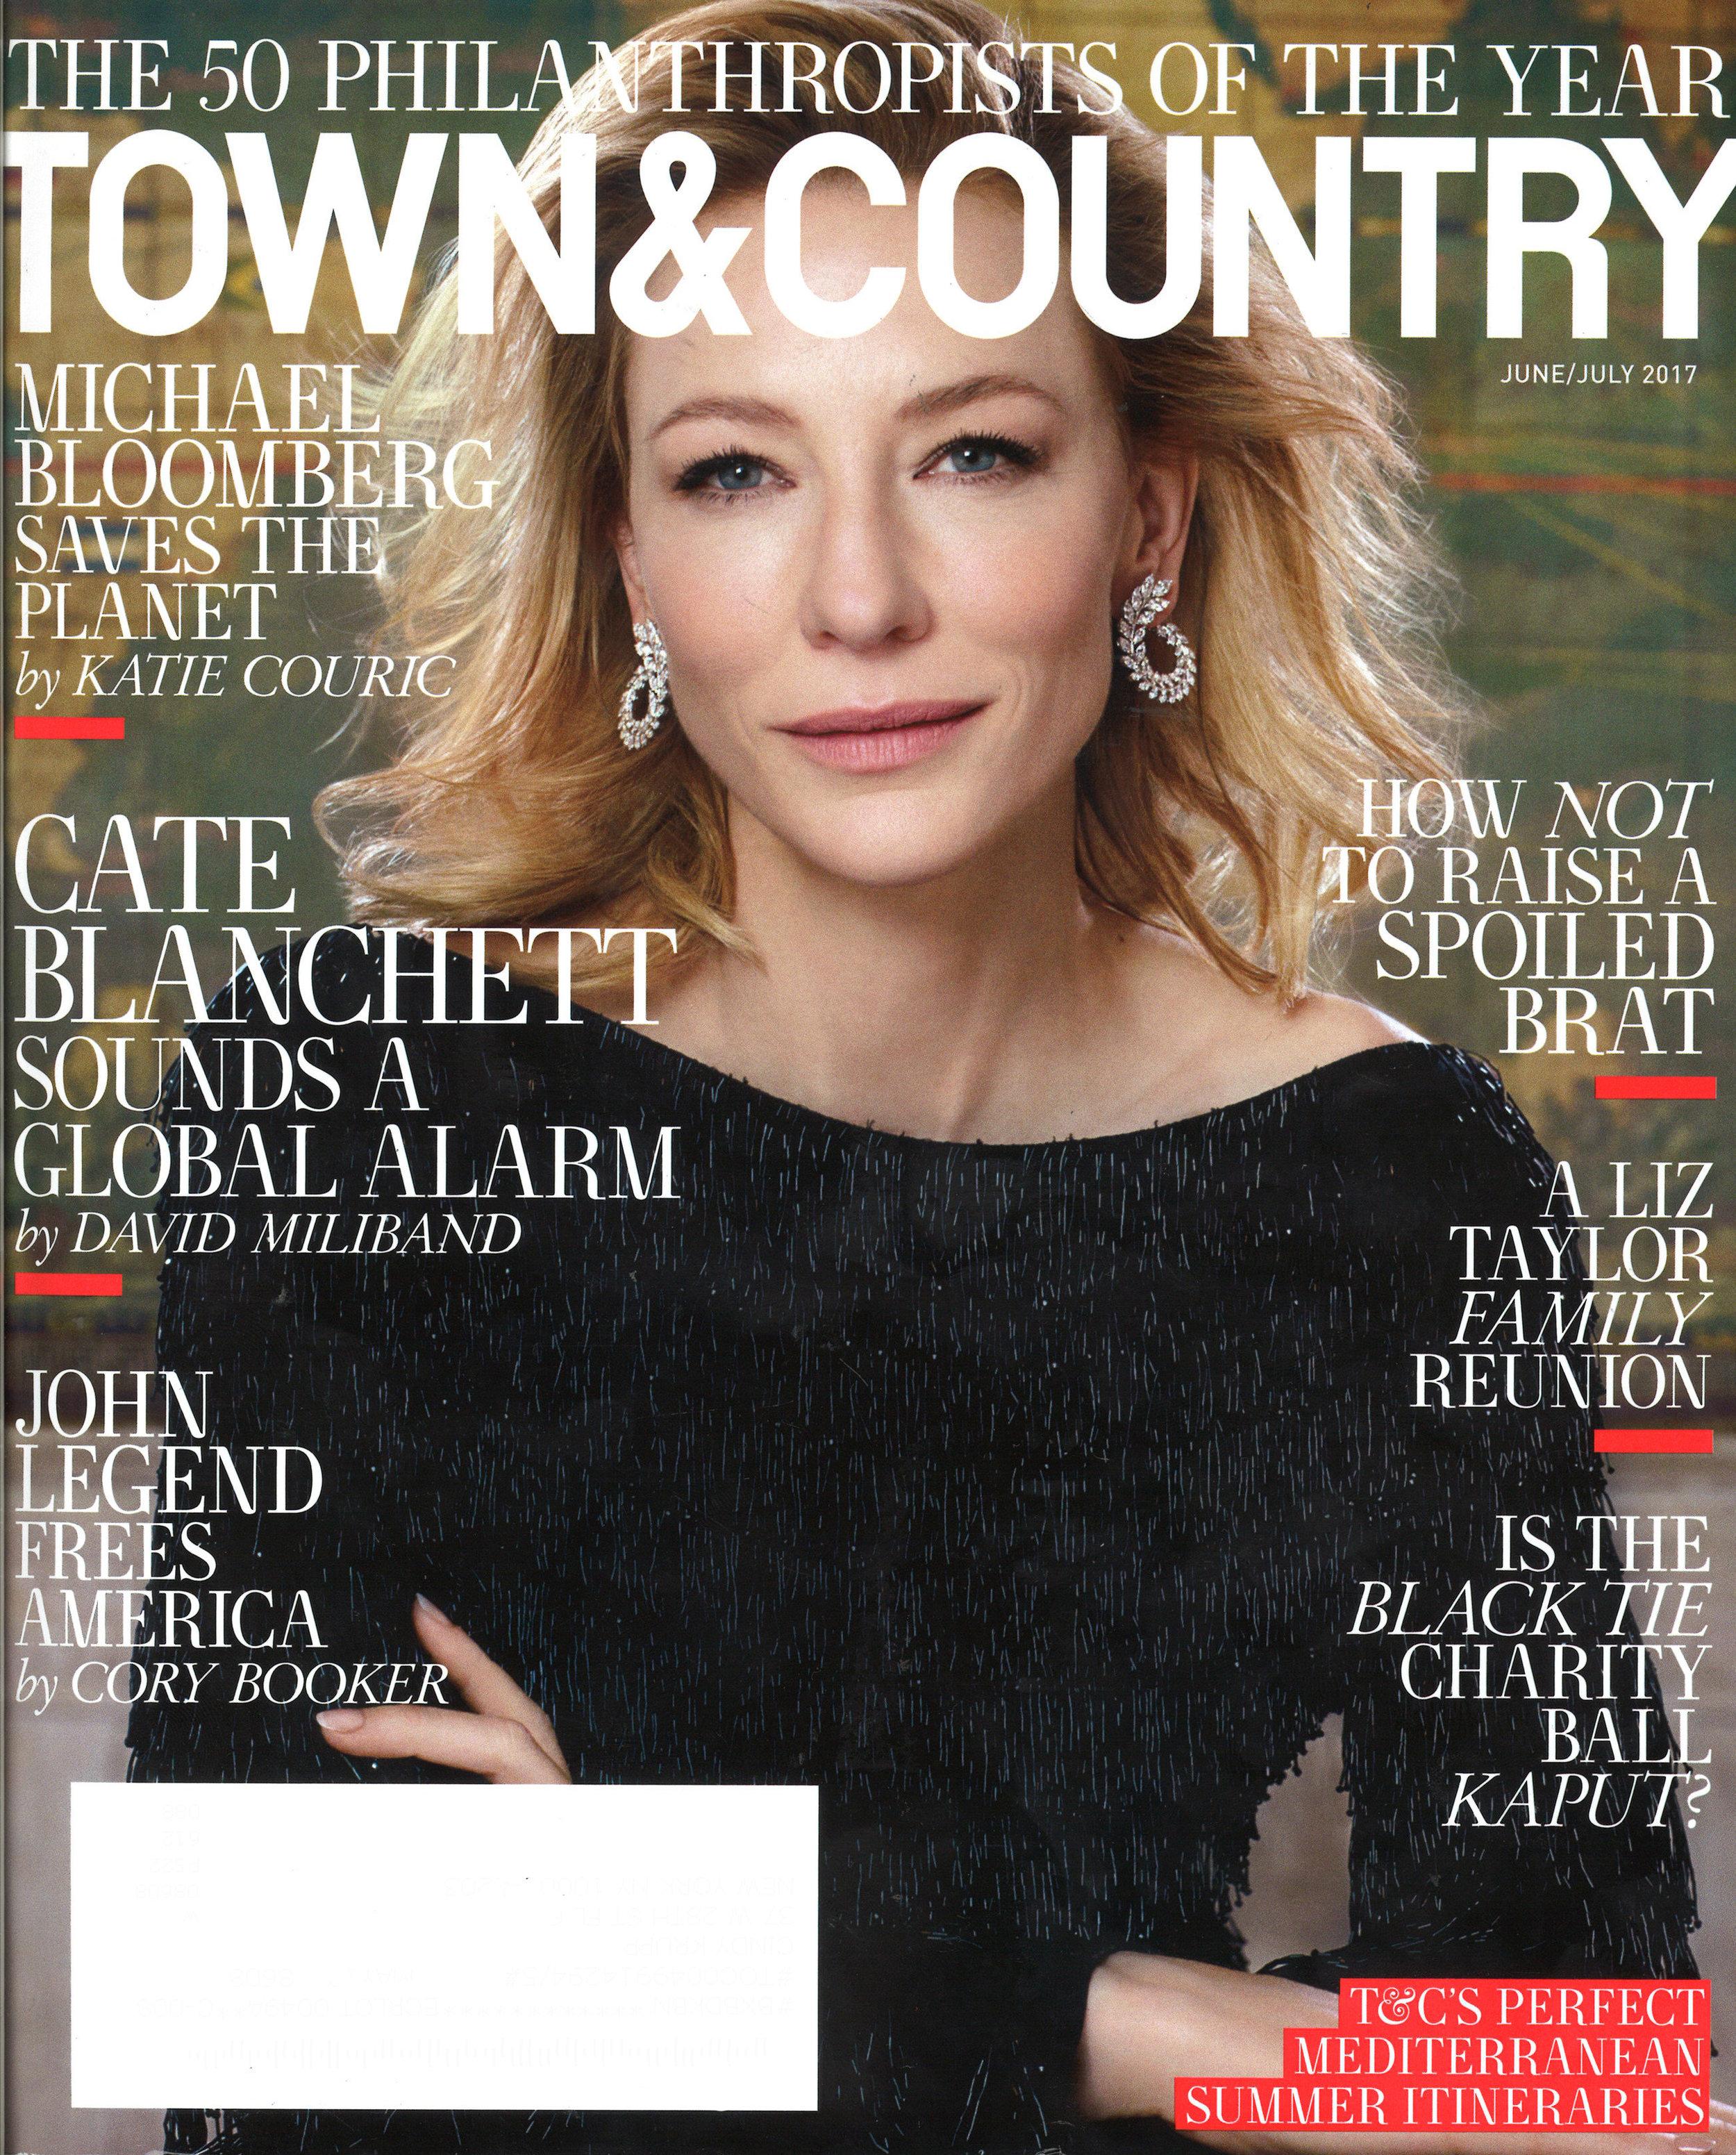 EL_Town&Country3_JuneJuly17-1.jpg